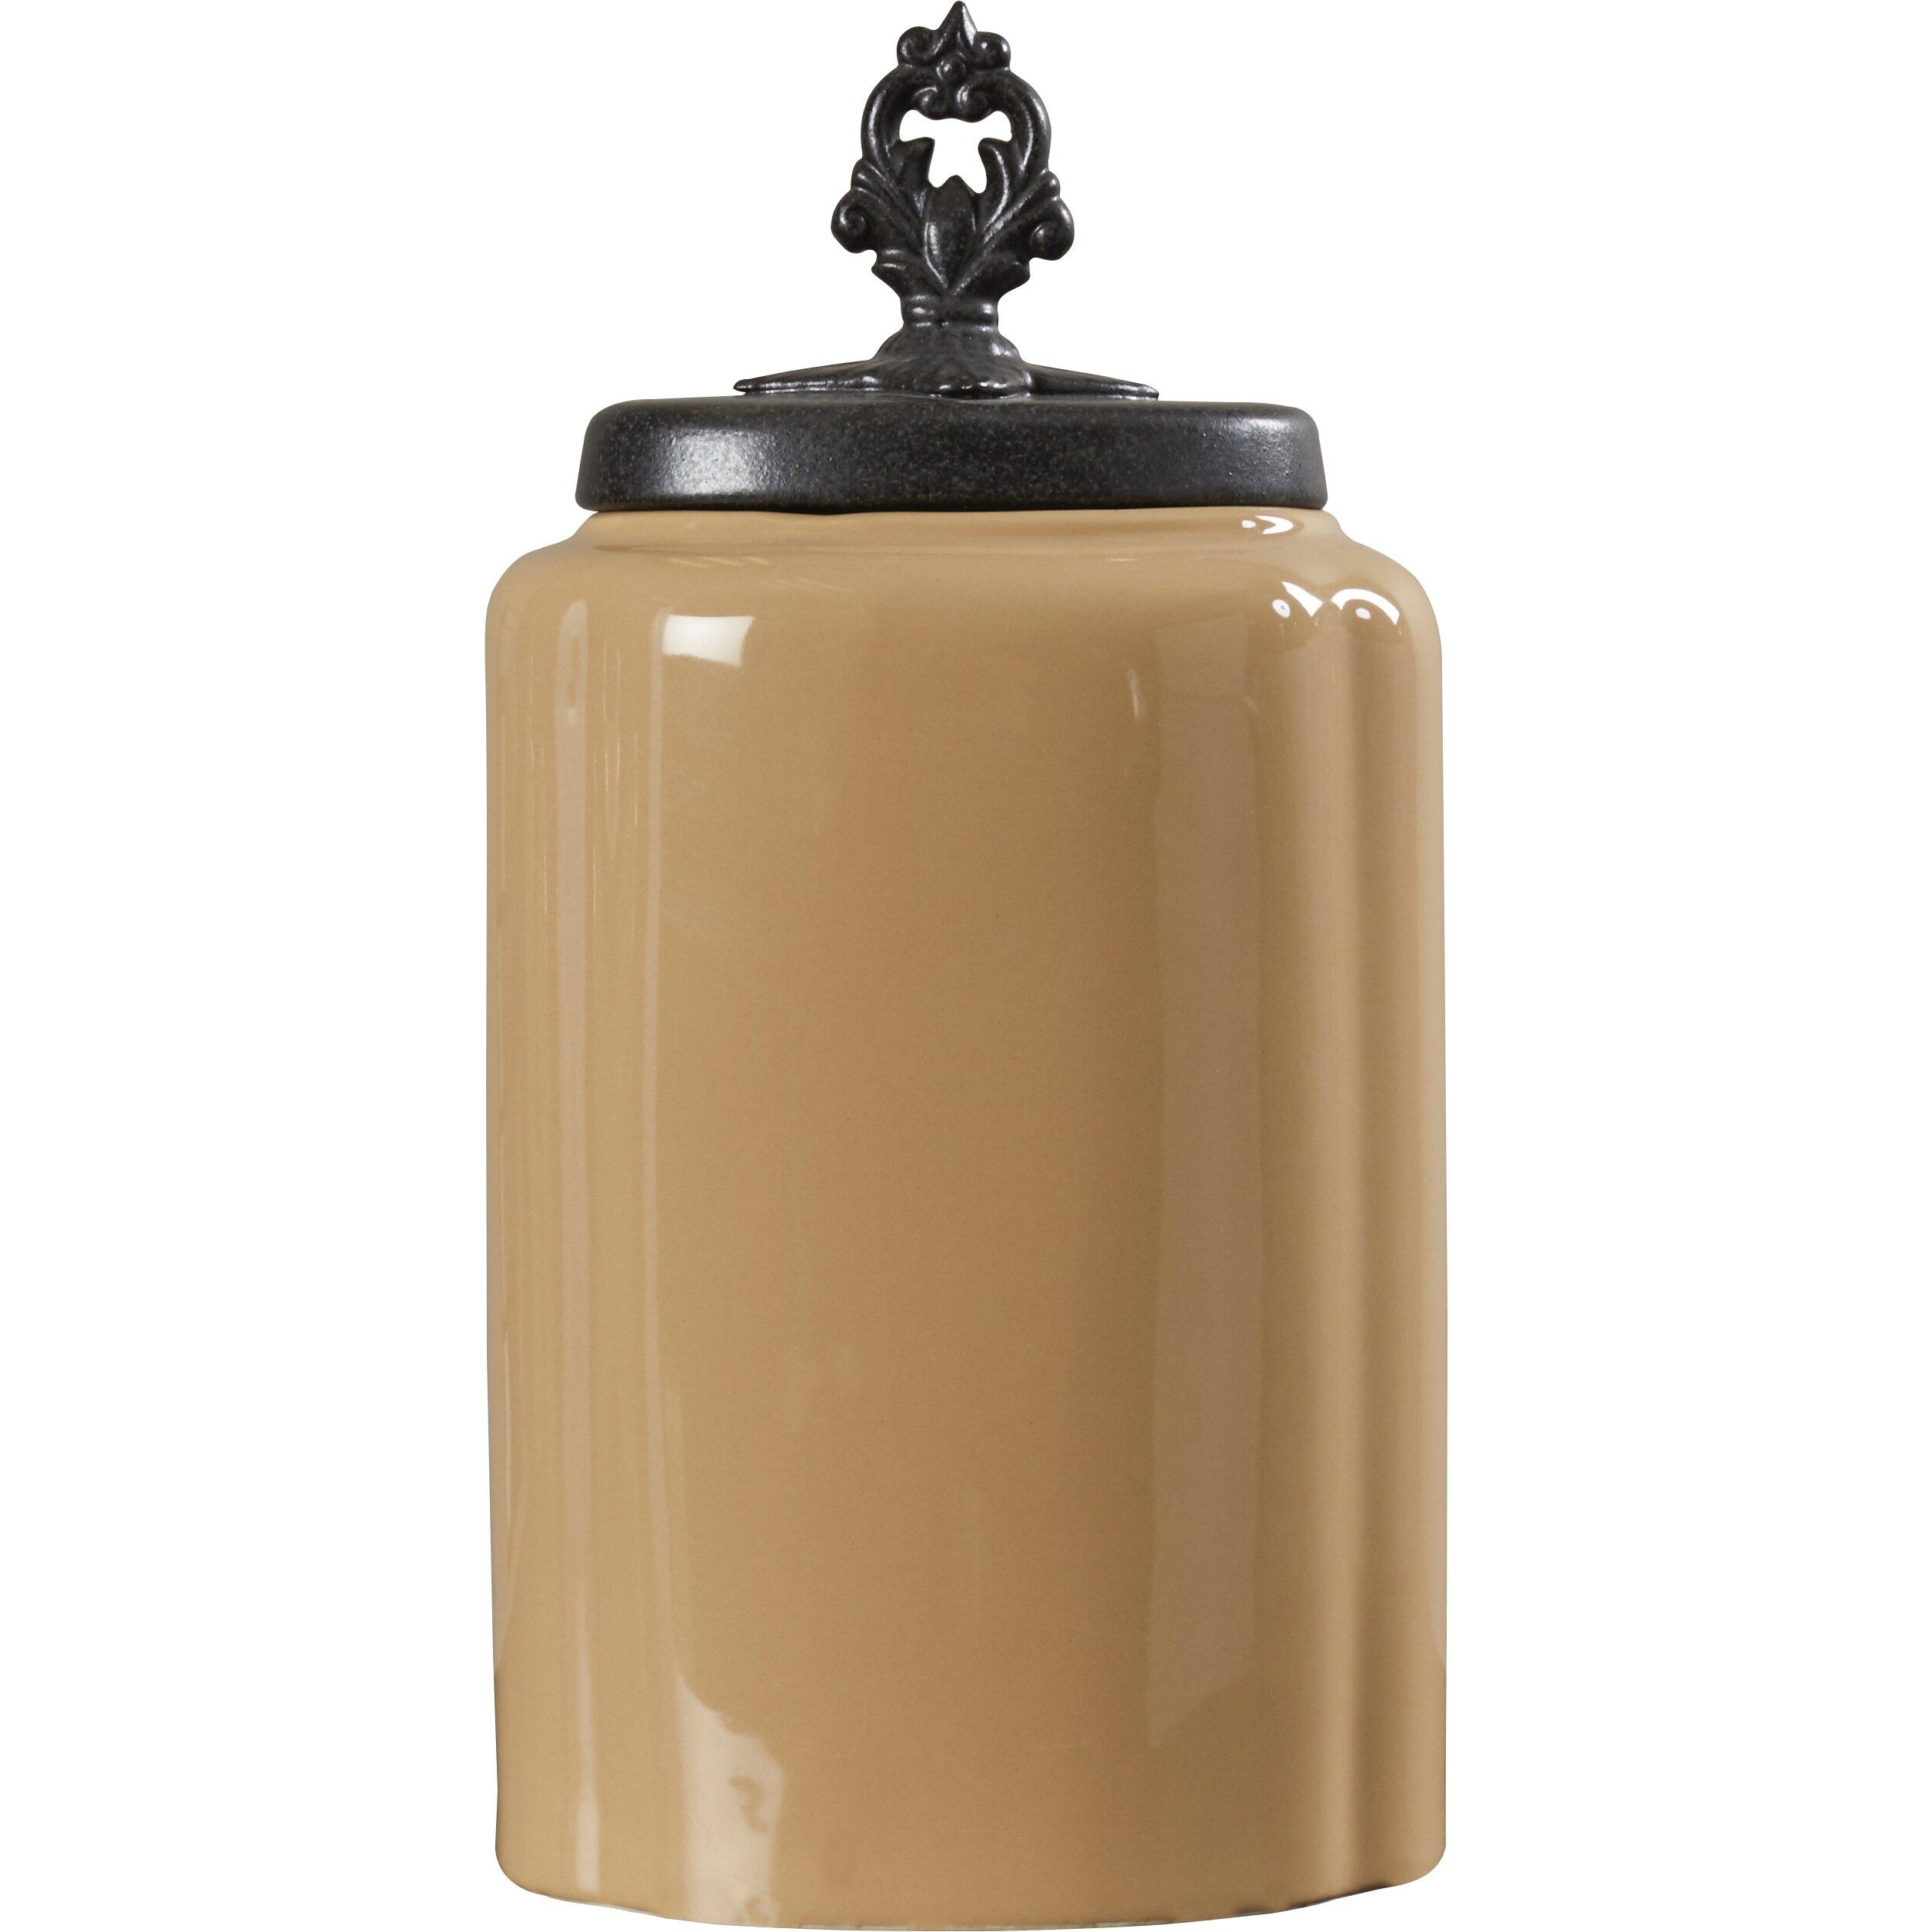 design guild 3 piece kitchen canister set reviews